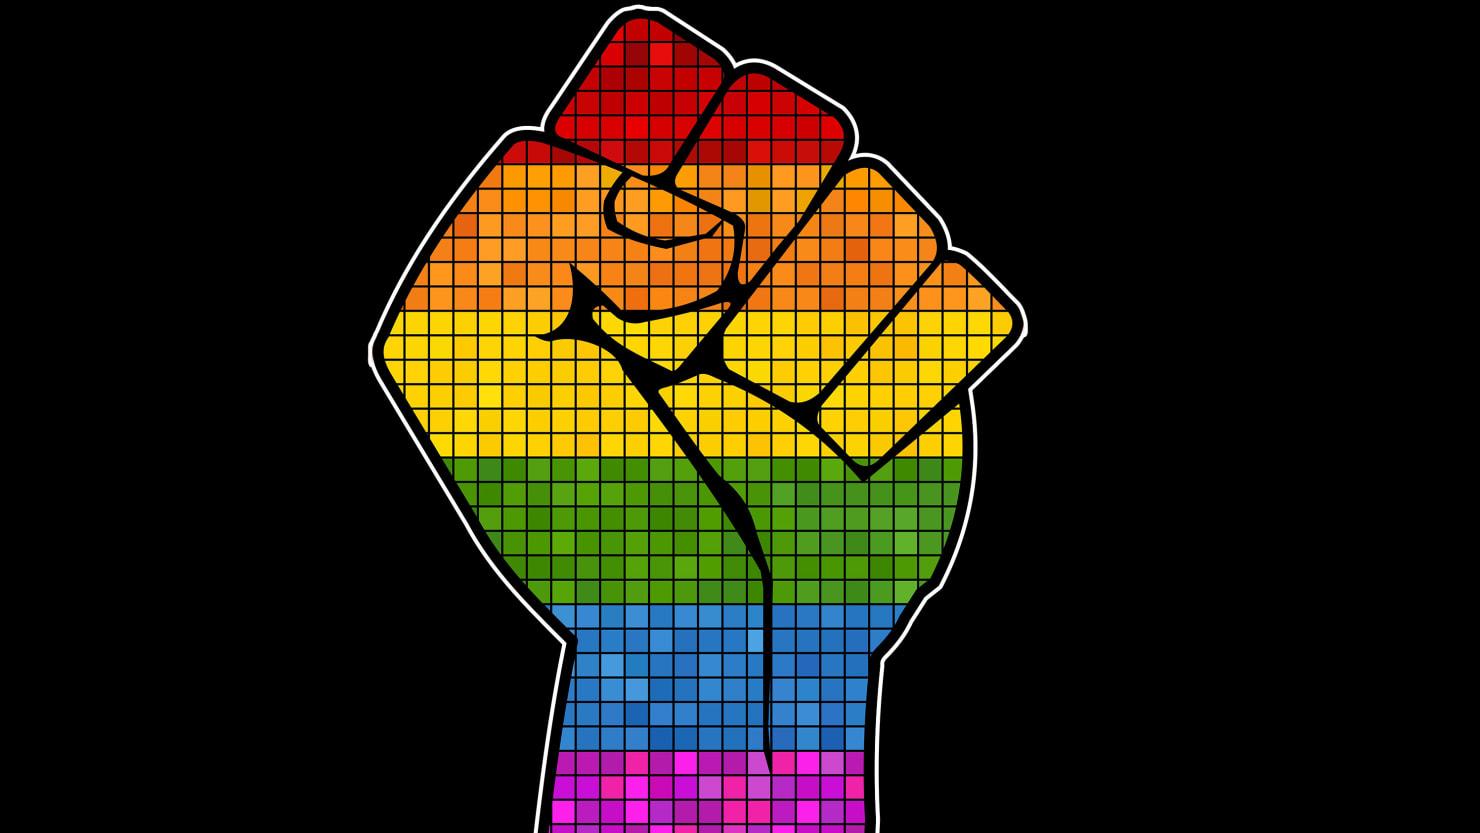 Black Trans Lives Matter - cover